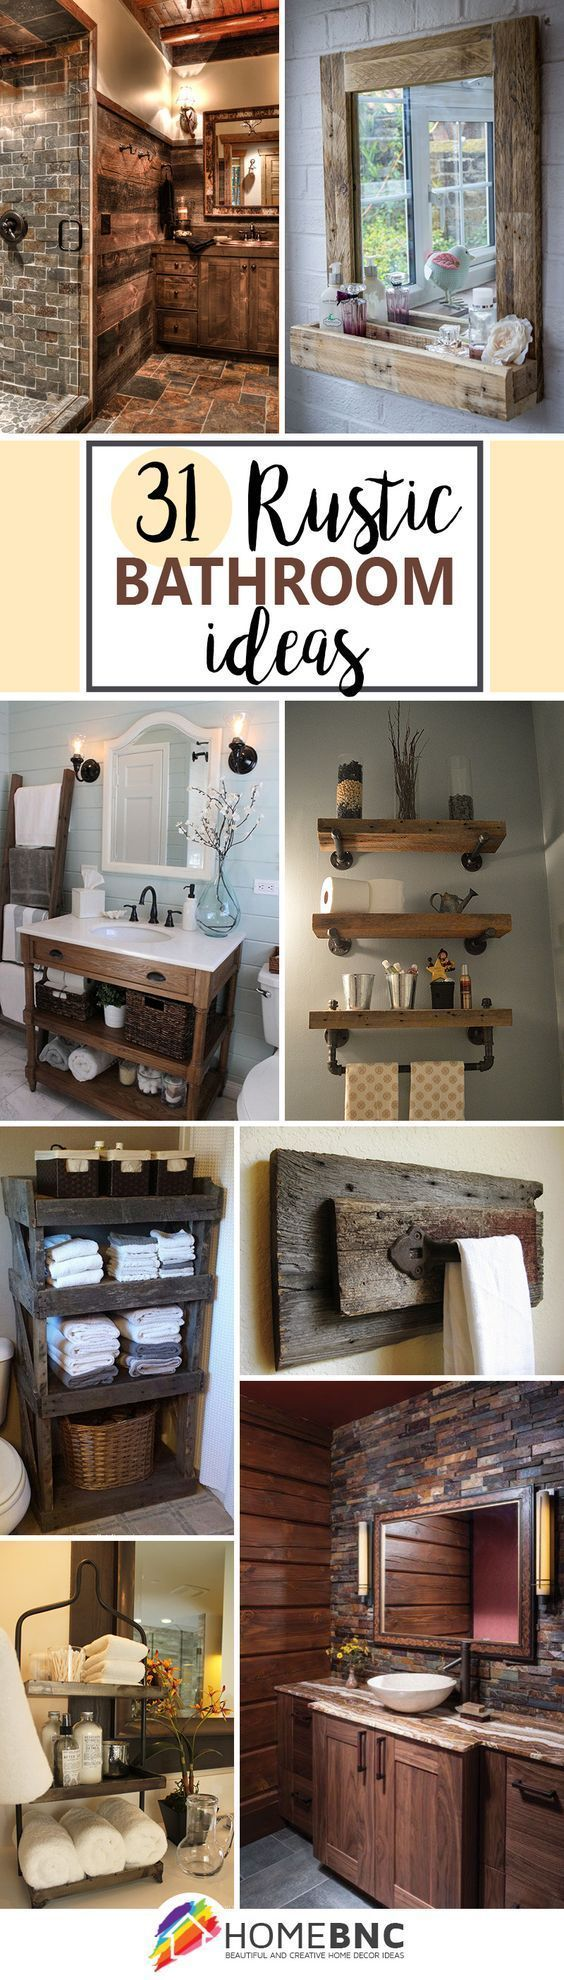 Best Ideas About Rustic Basement On Pinterest Rustic Man Cave - Rustic basement ideas